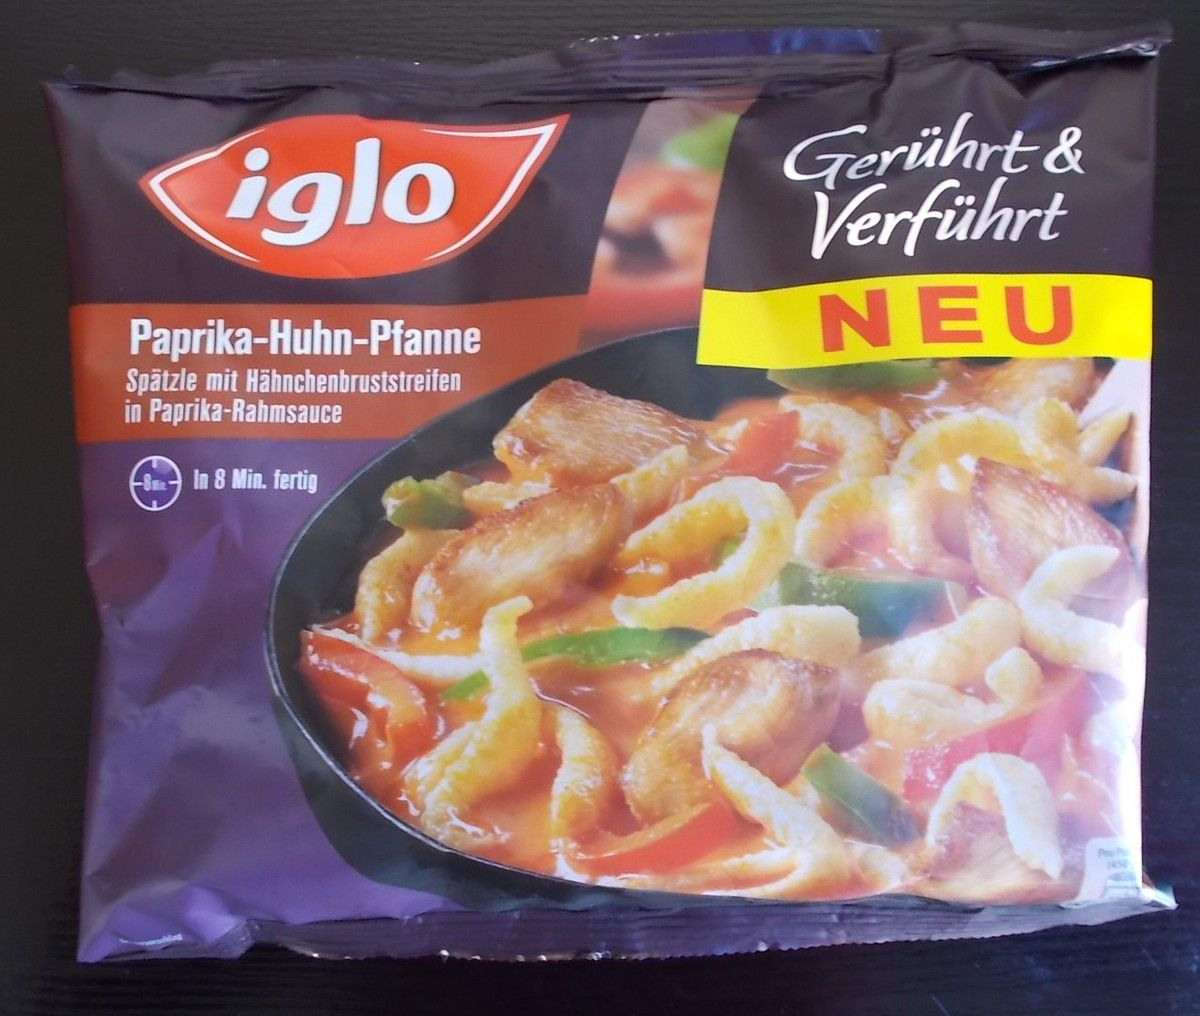 iglo Gerührt & Verführt Paprika-Huhn-Pfanne